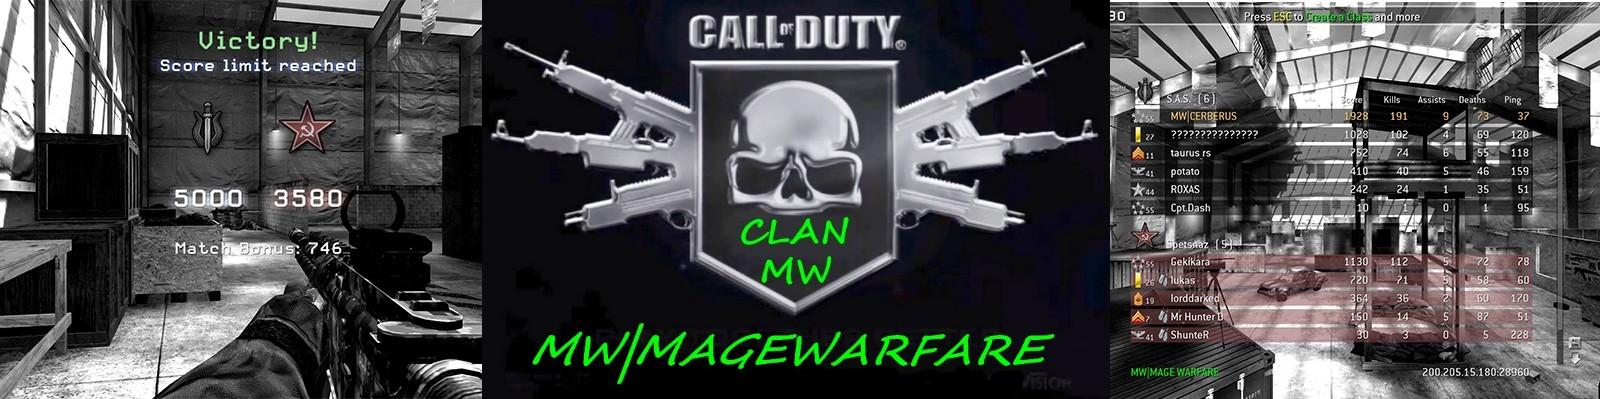 MW|MAGEWARFARE